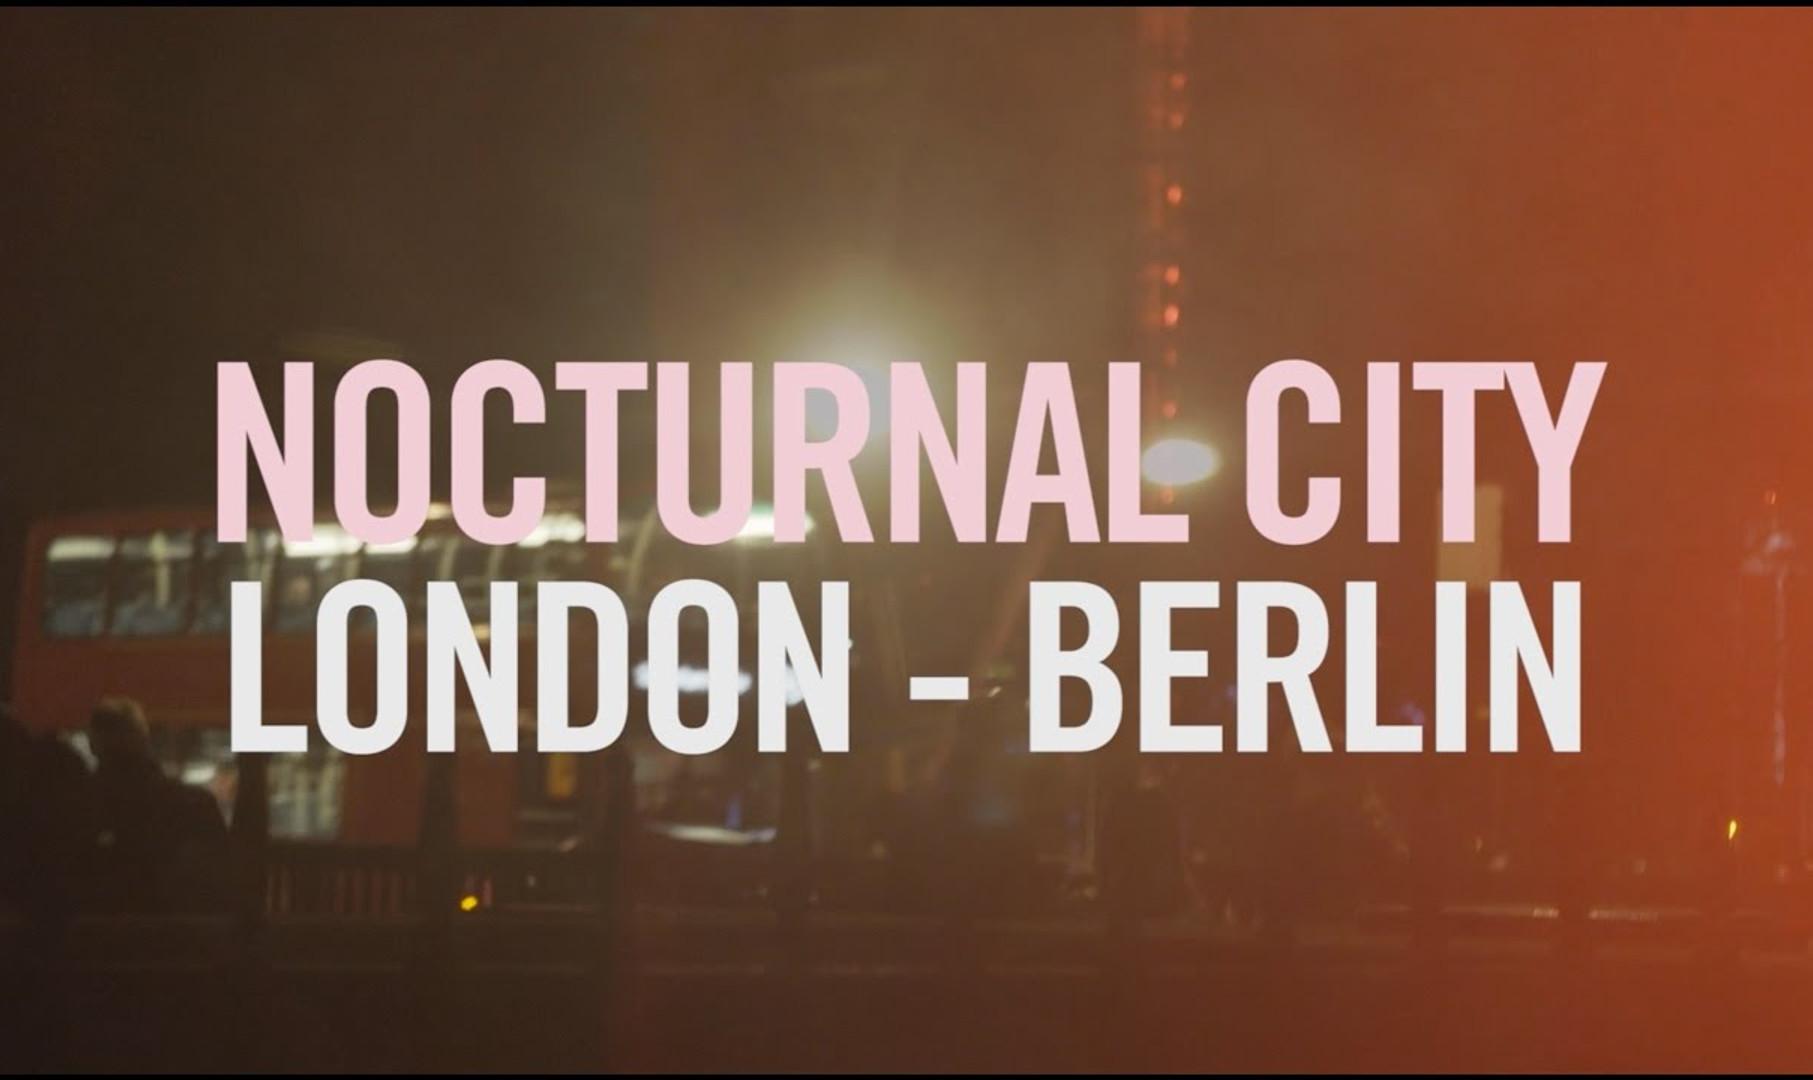 Nocturnal City London - Berlin